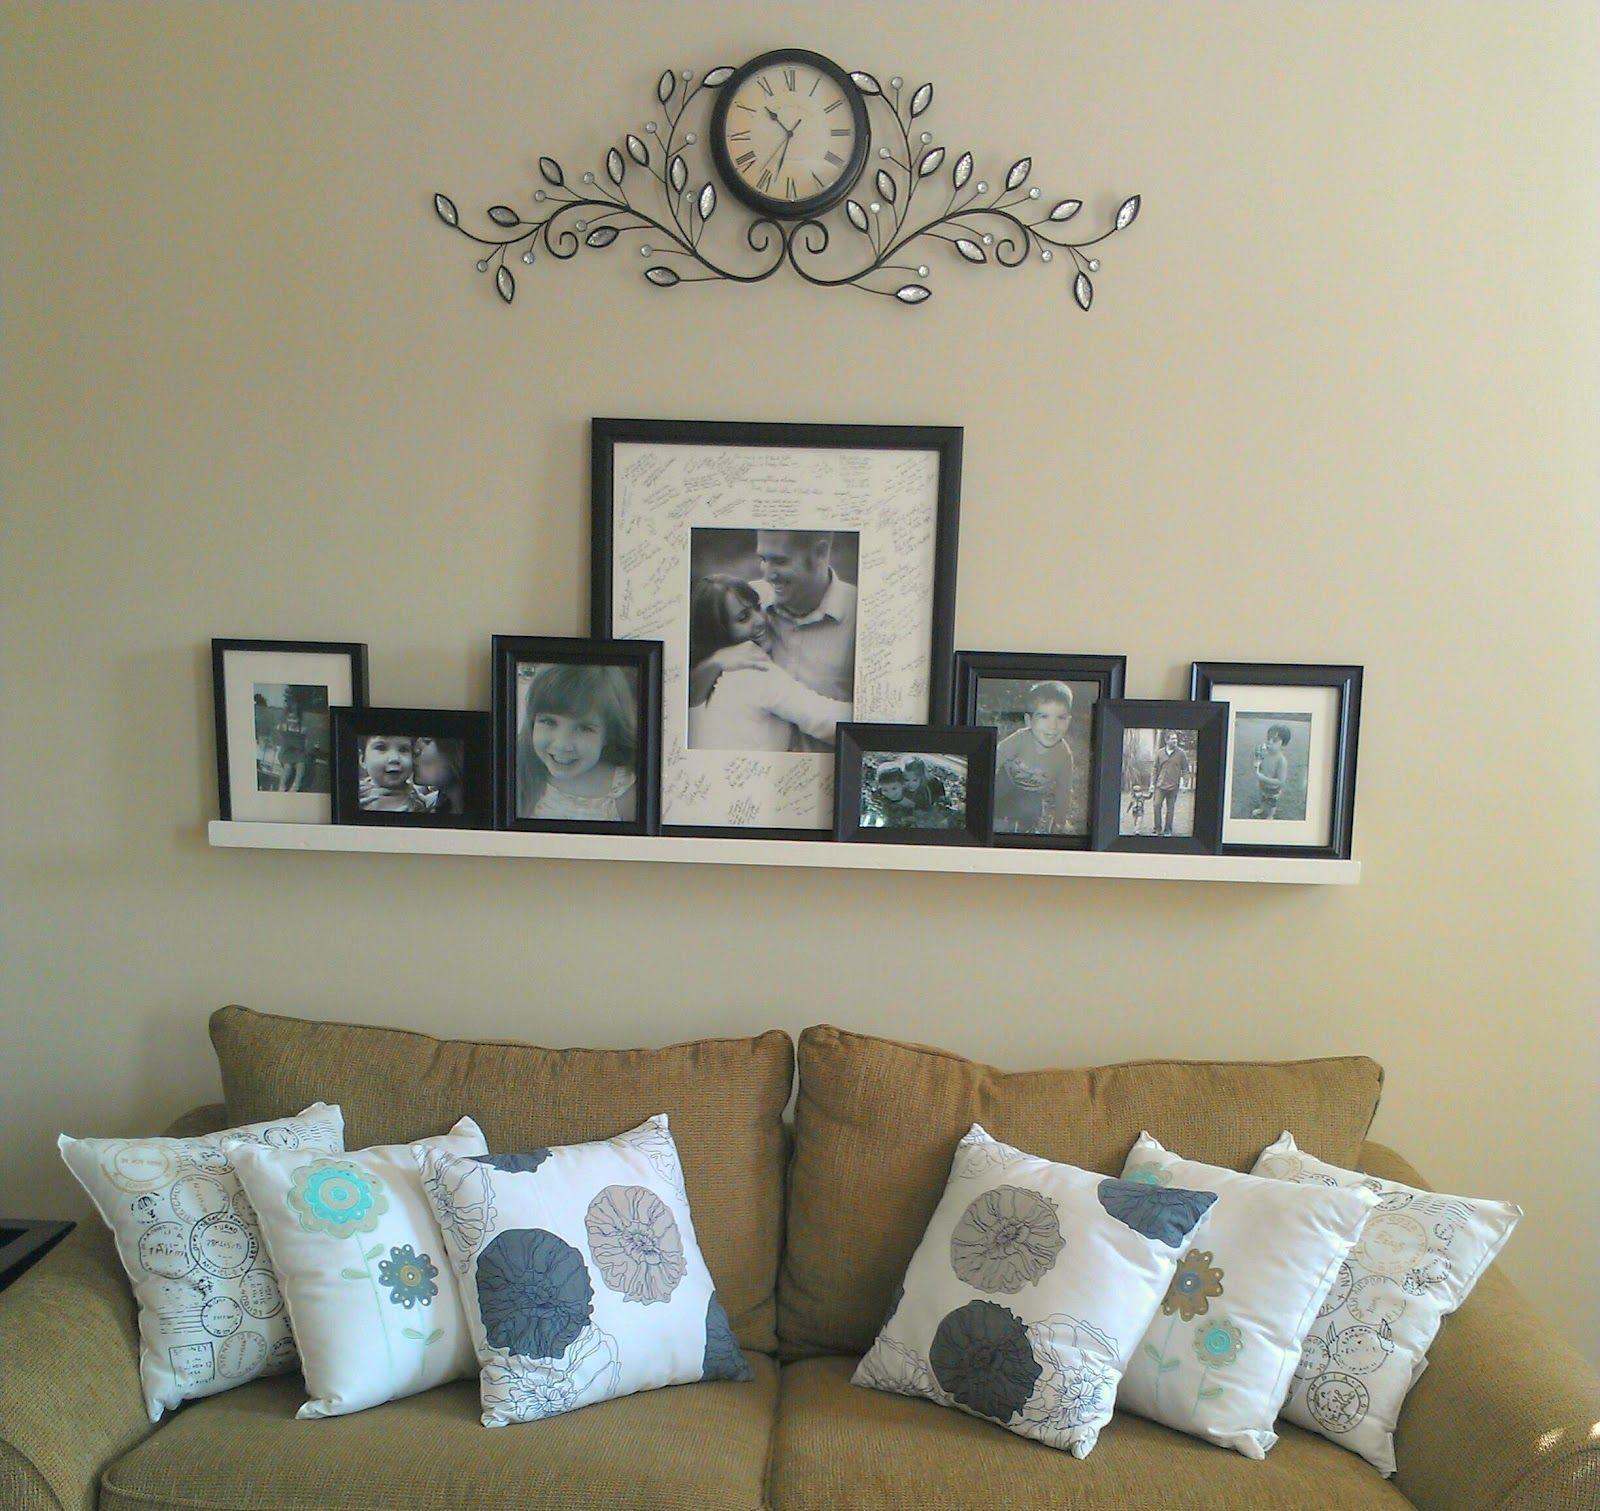 Diy Photo Ledge, Black Frames And B Prints From Cvs